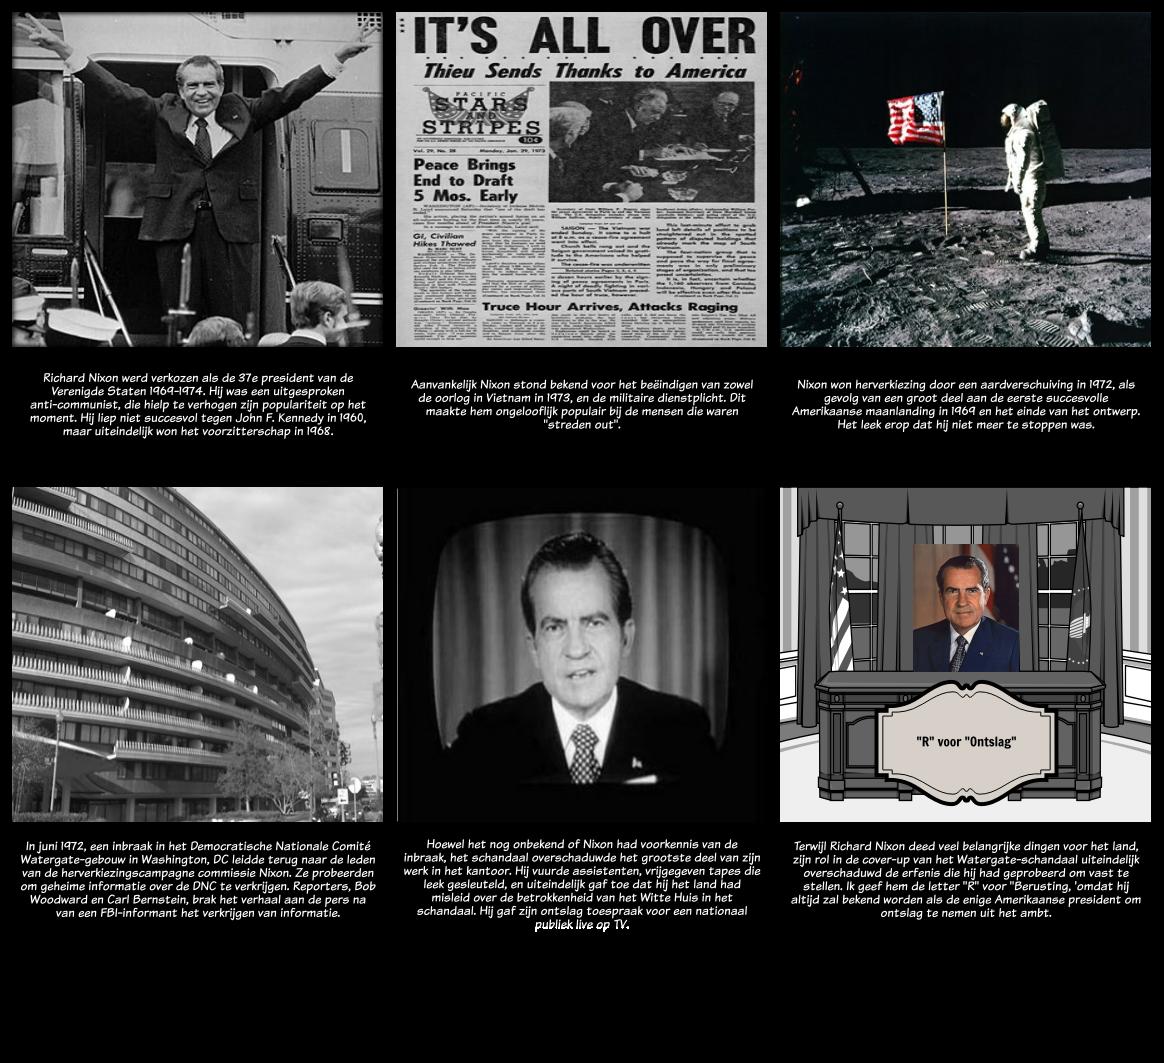 Schandaal in The Scarlet Letter - Richard Nixon